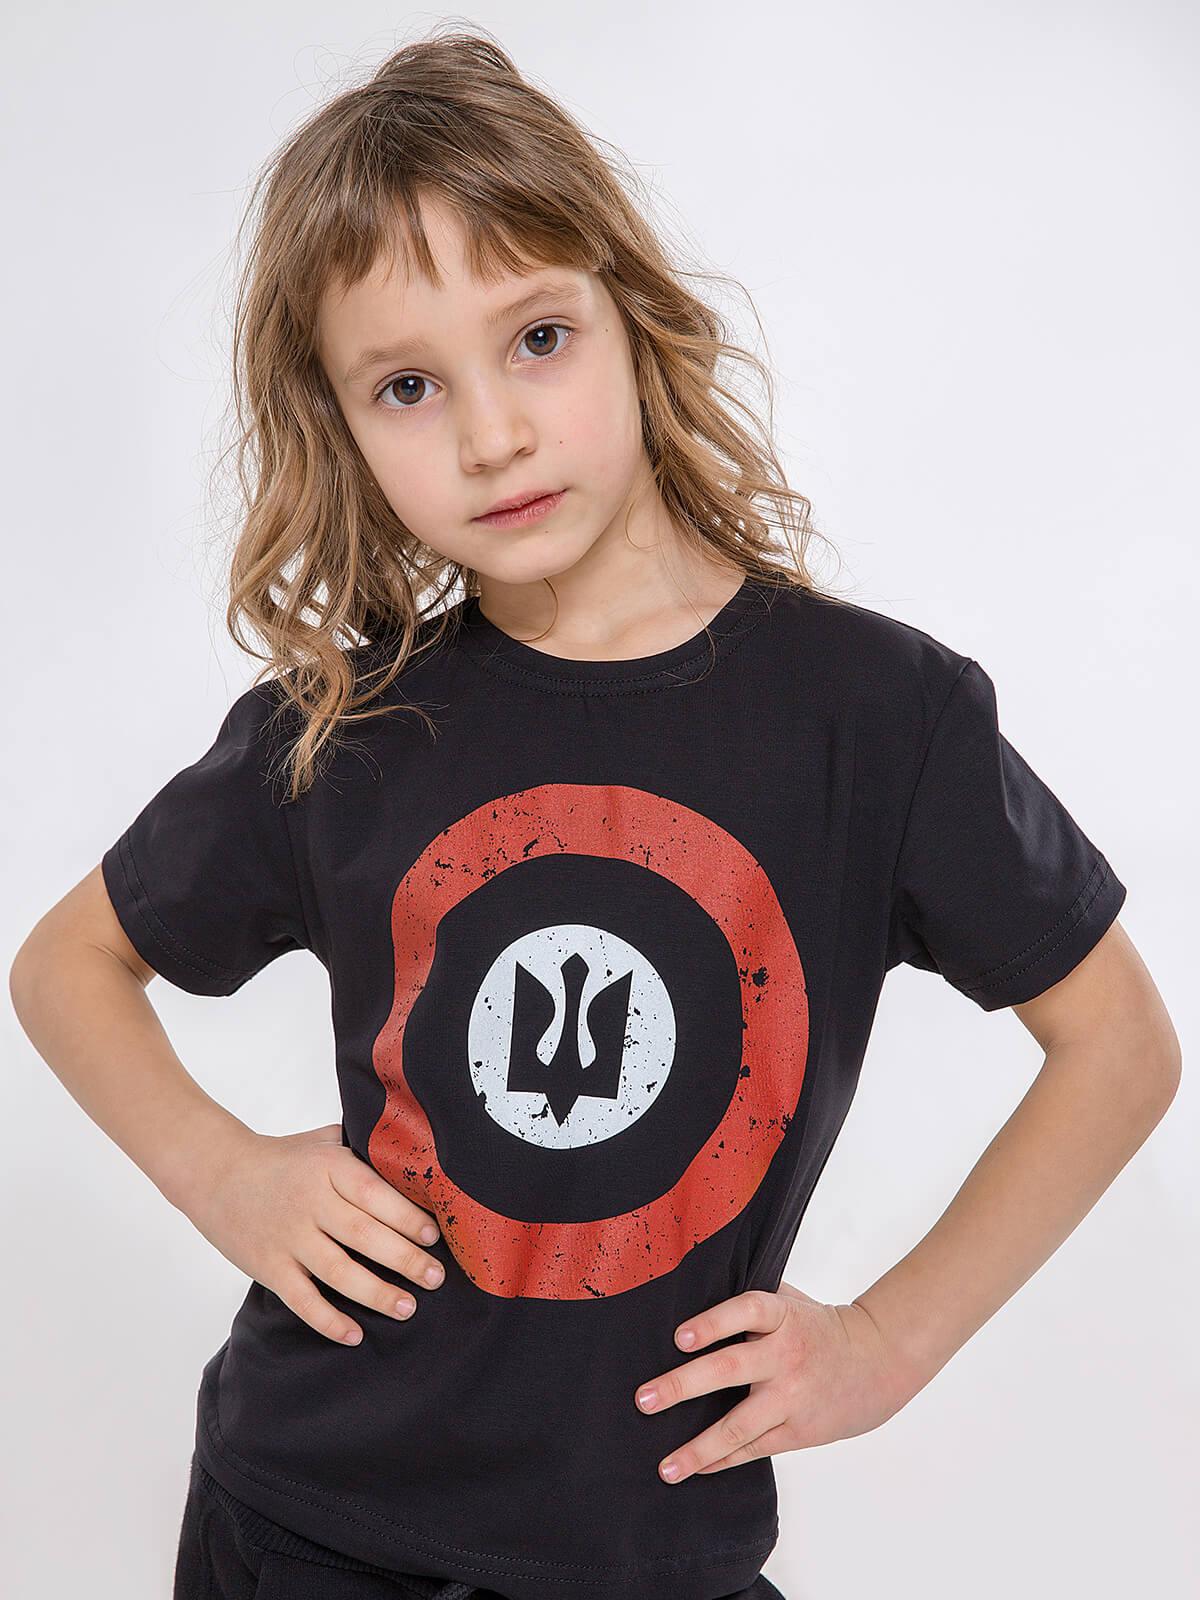 Kids T-Shirt Roundel. Color black.  Technique of prints applied: silkscreen printing.